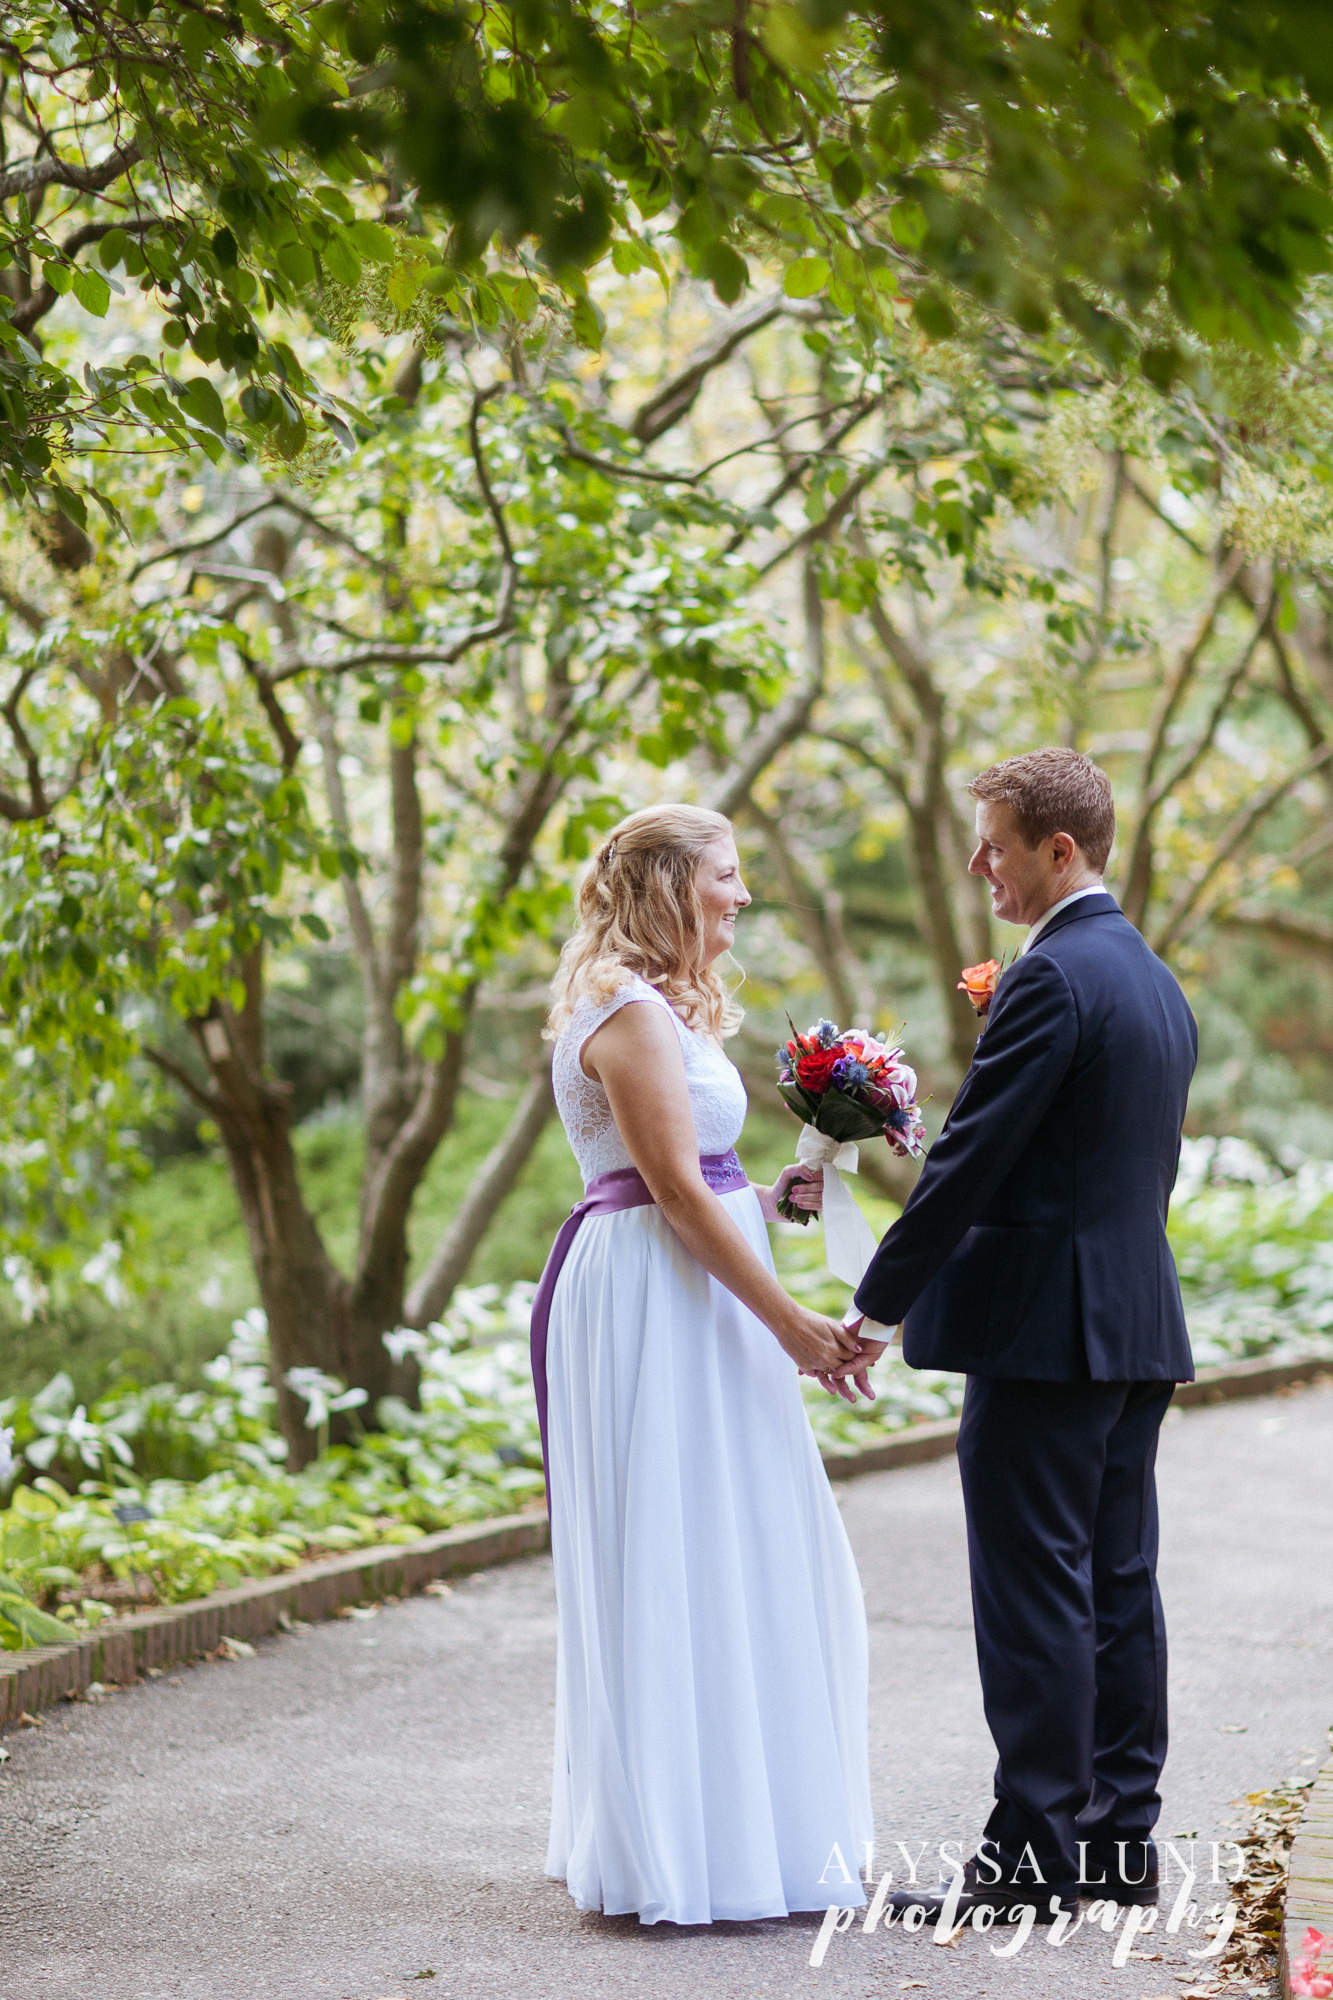 Outdoor wedding at the Minnesota Landscape Arboretum